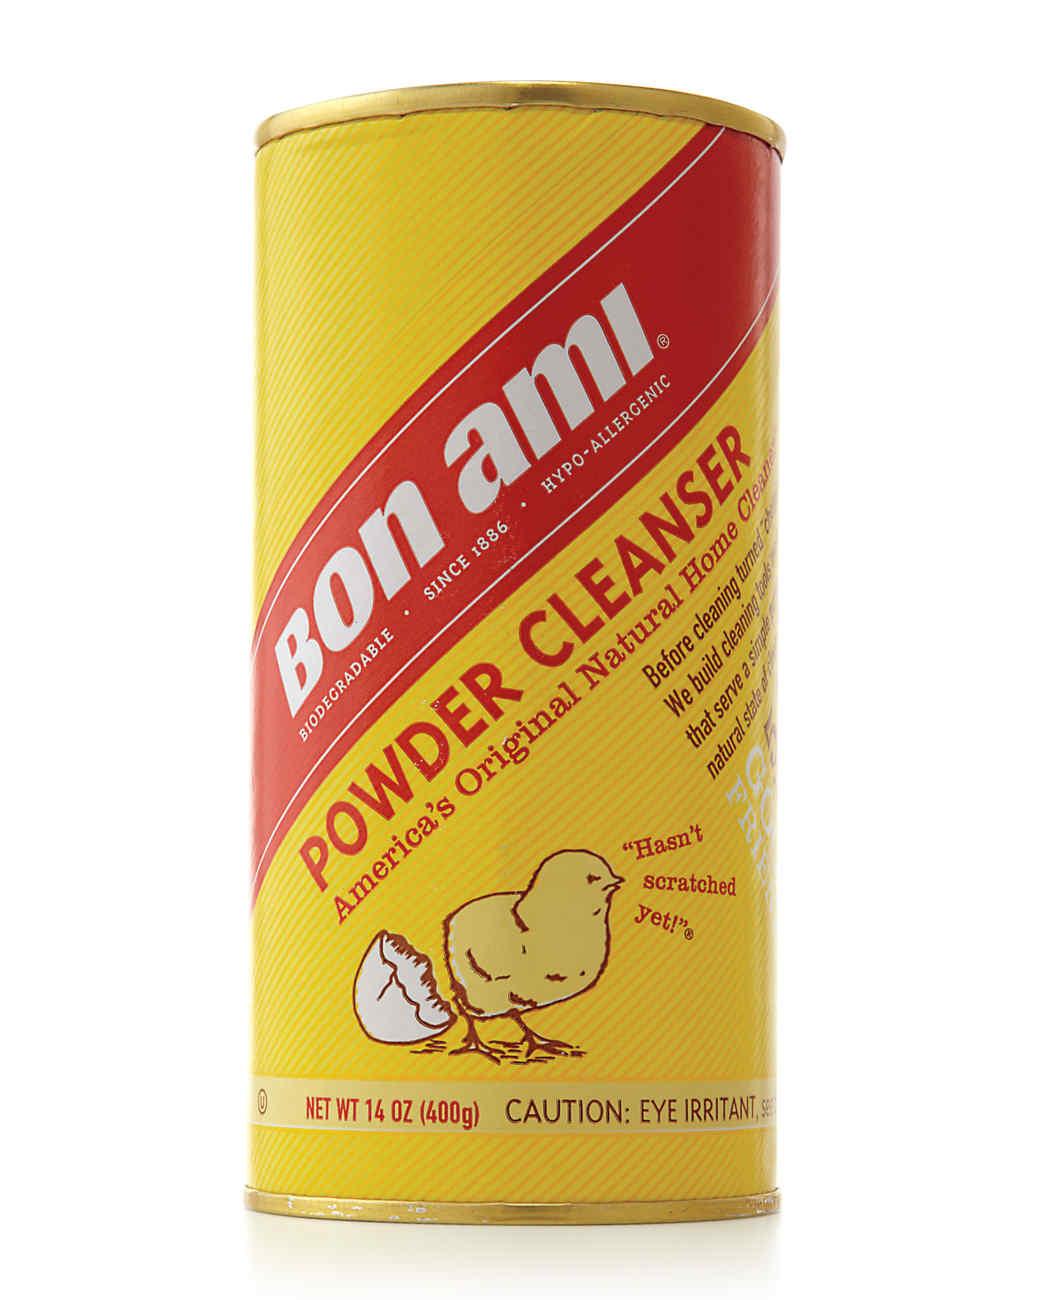 bon-ami-powder-mld108211.jpg